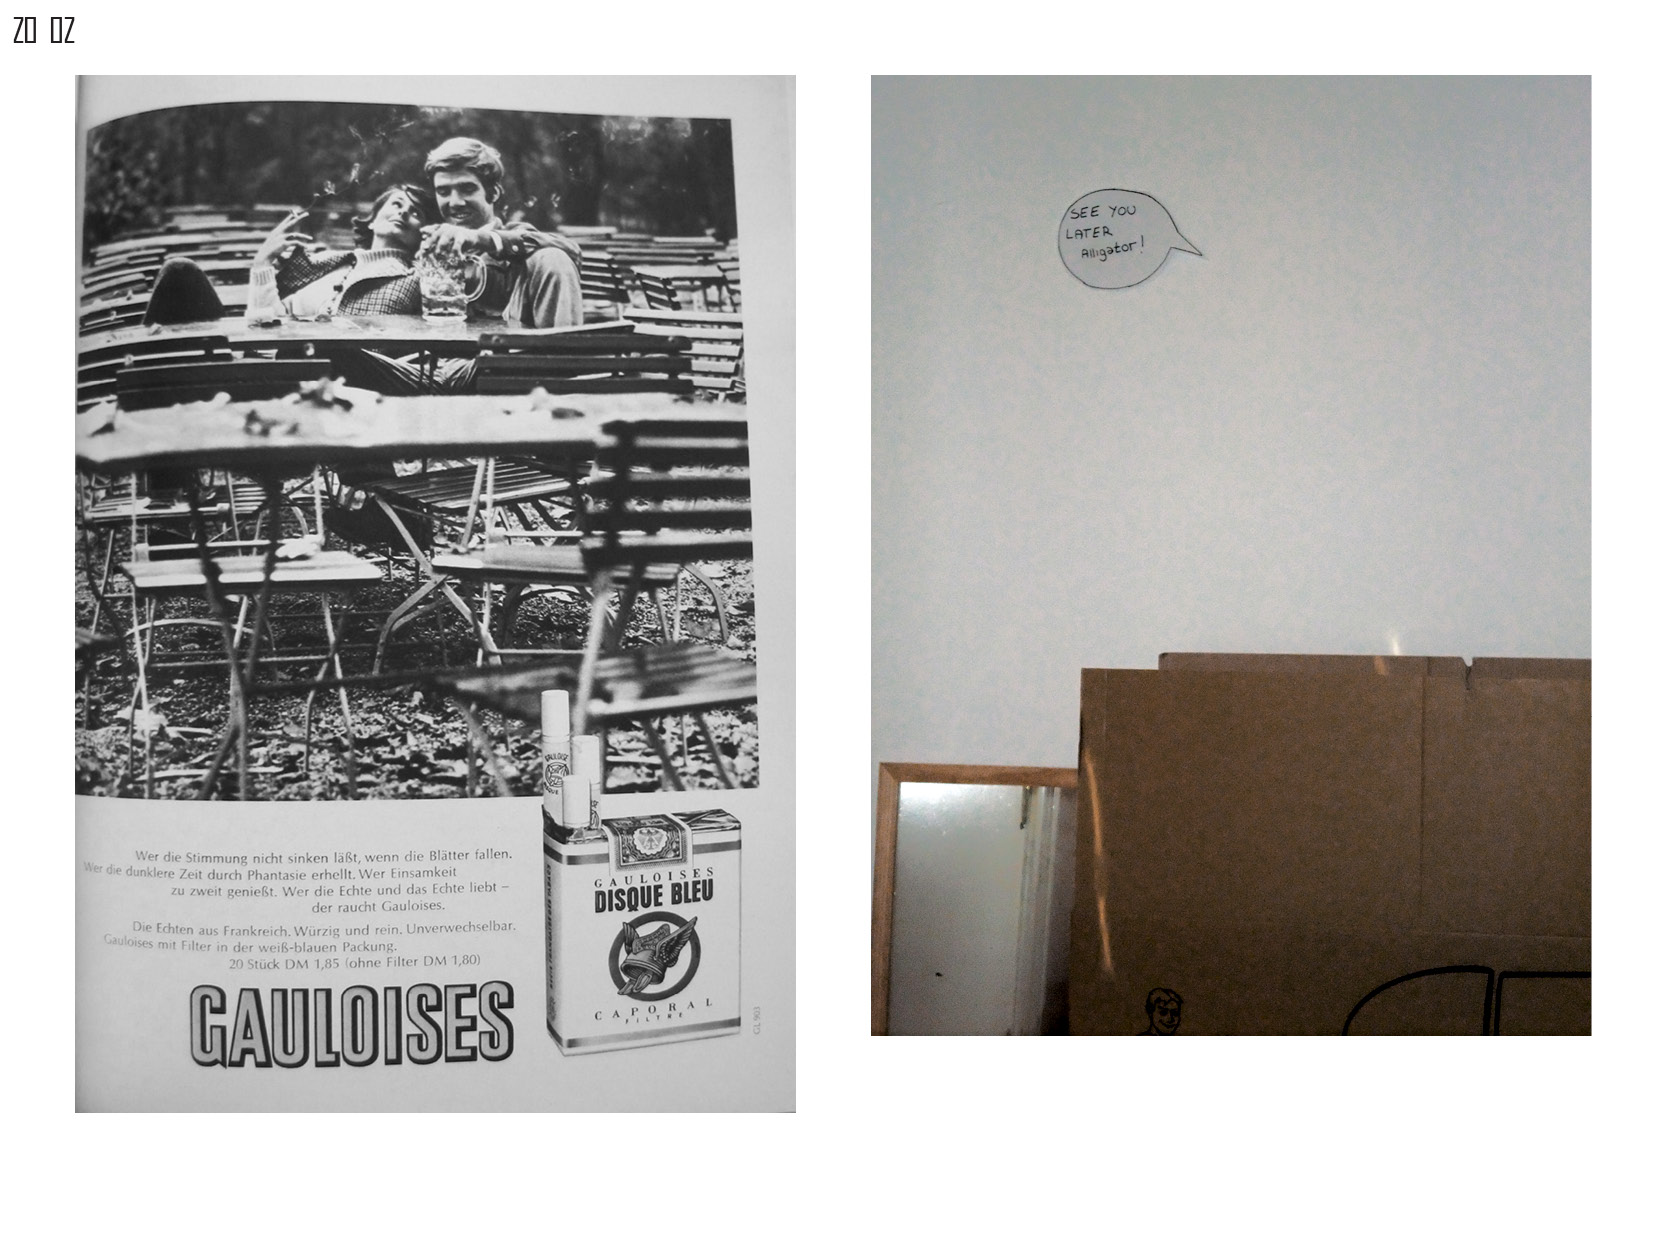 Gerrit-Schweiger-Dialog-Städte-Paris-Berlin-Jessica-Blank-Experiment-Fotoserie-Tagebuch-visuelle-Kommunikation-108